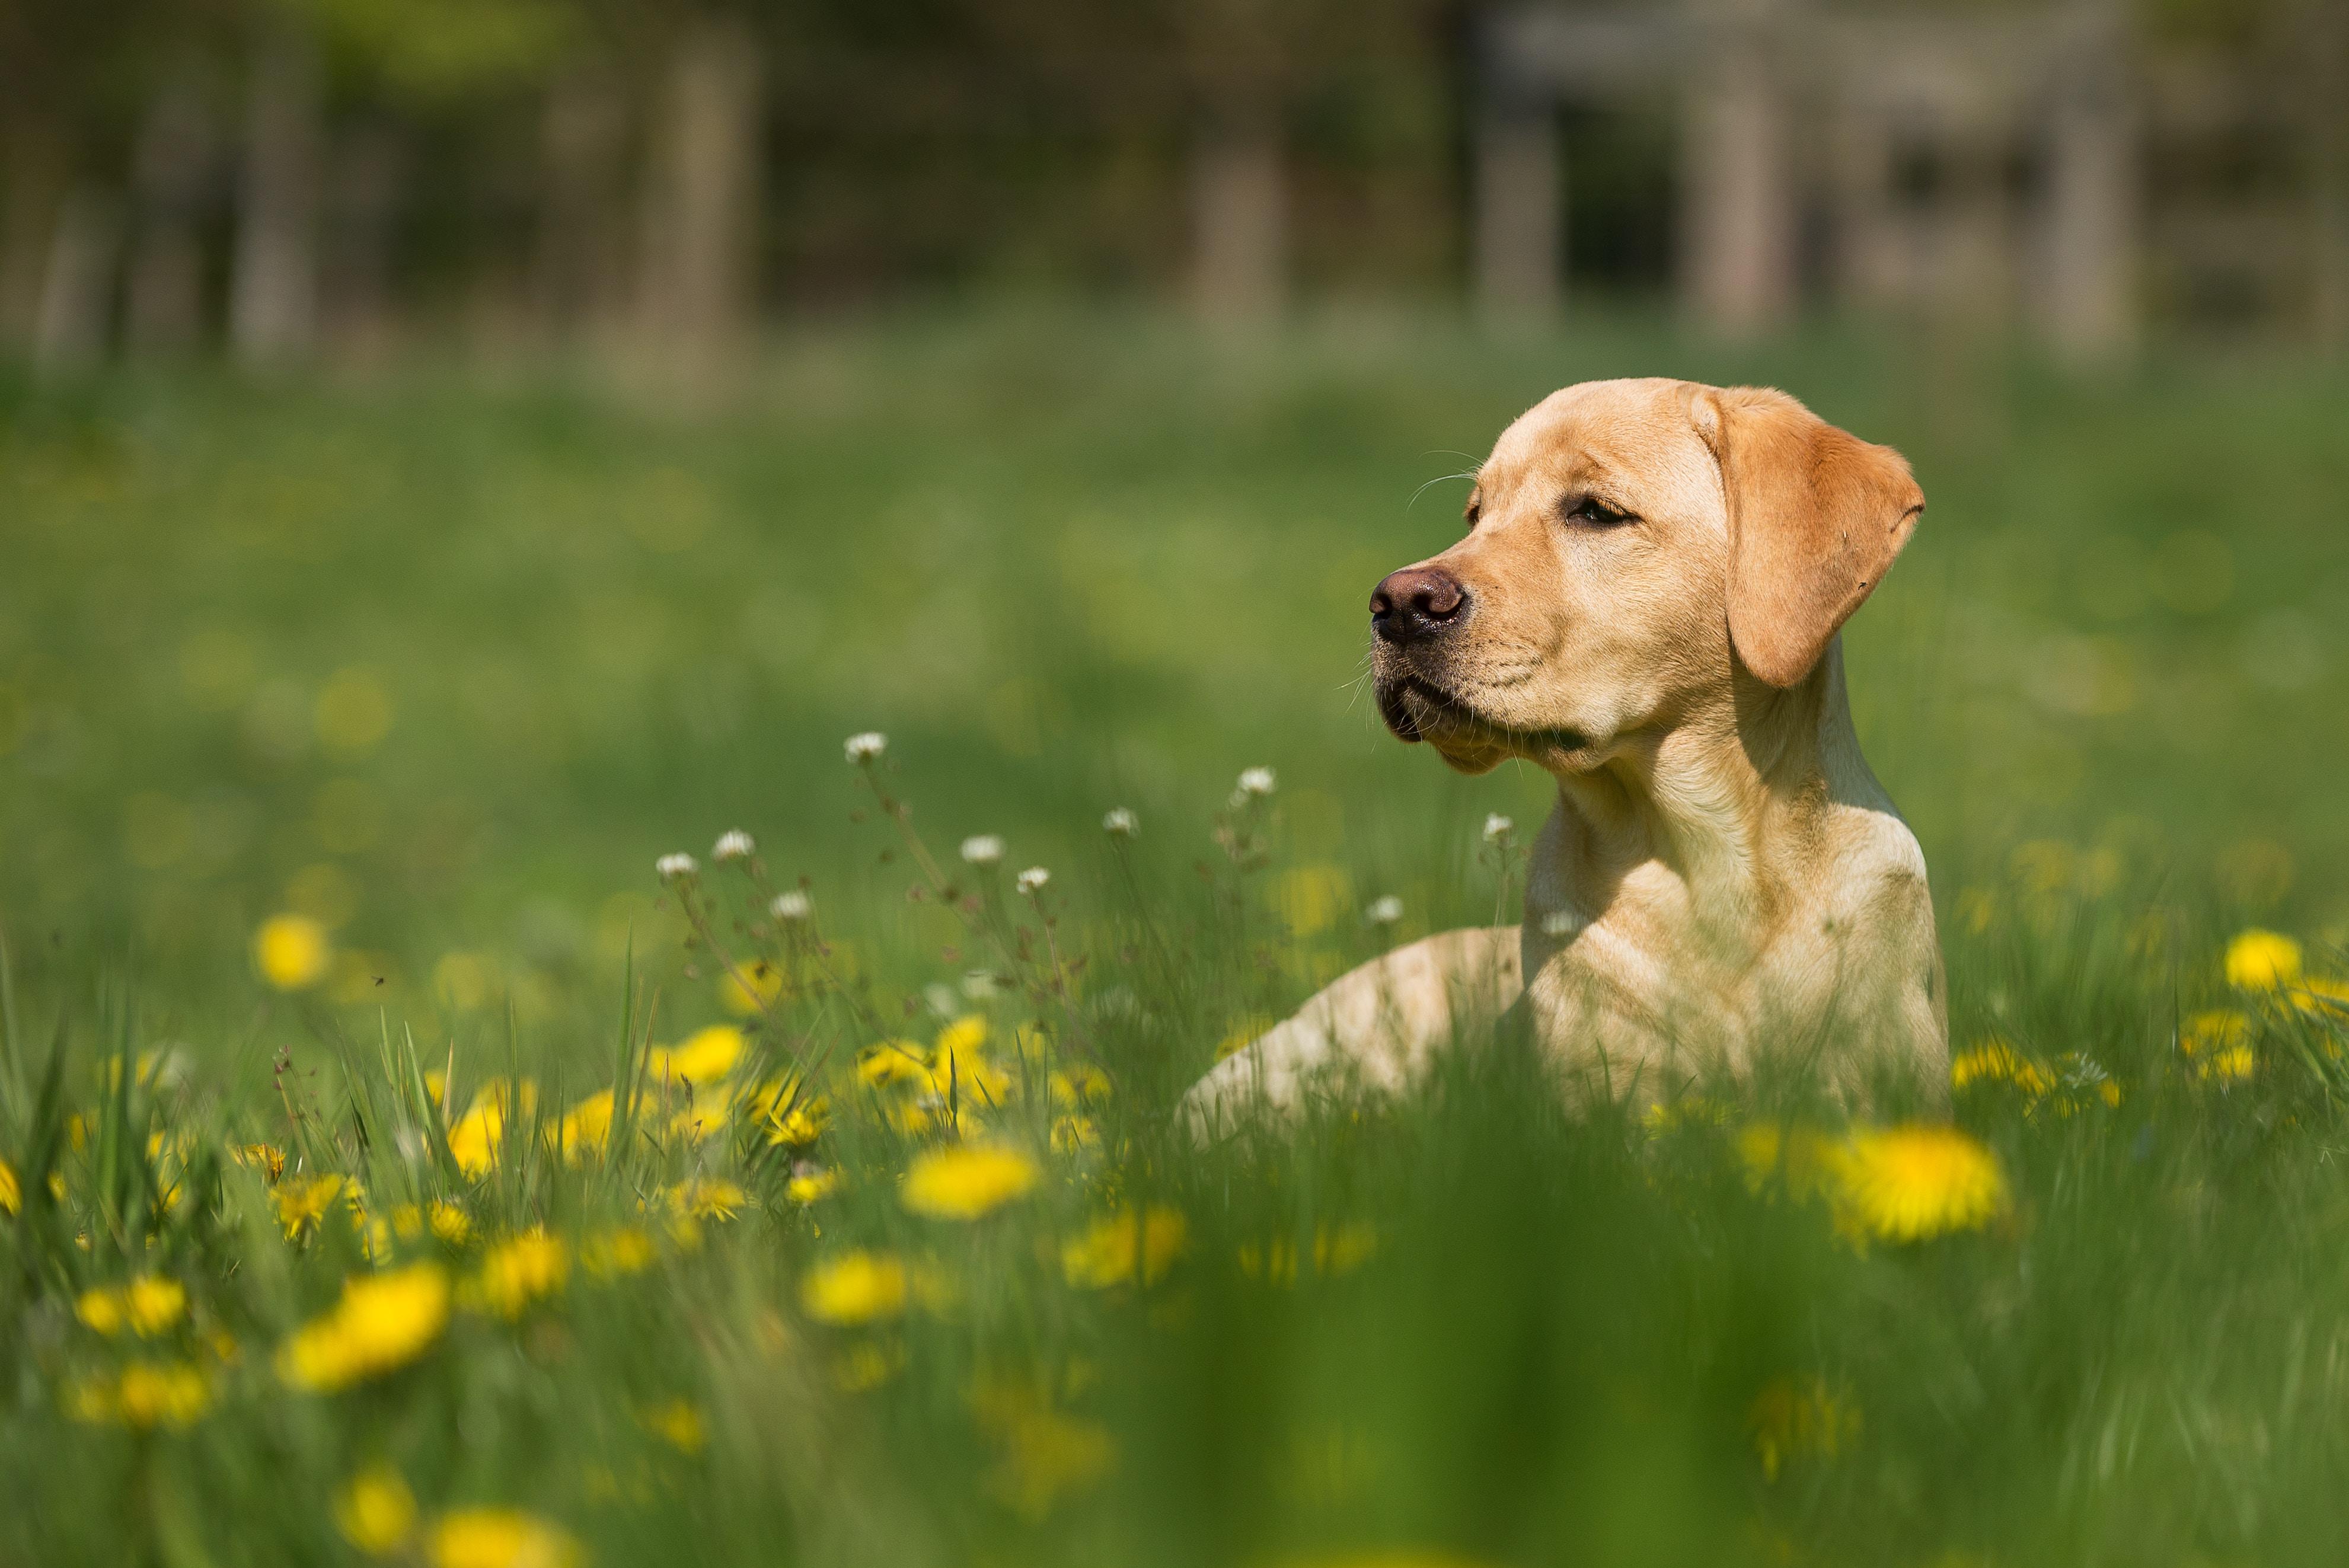 reclining adult yellow Labrador retriever